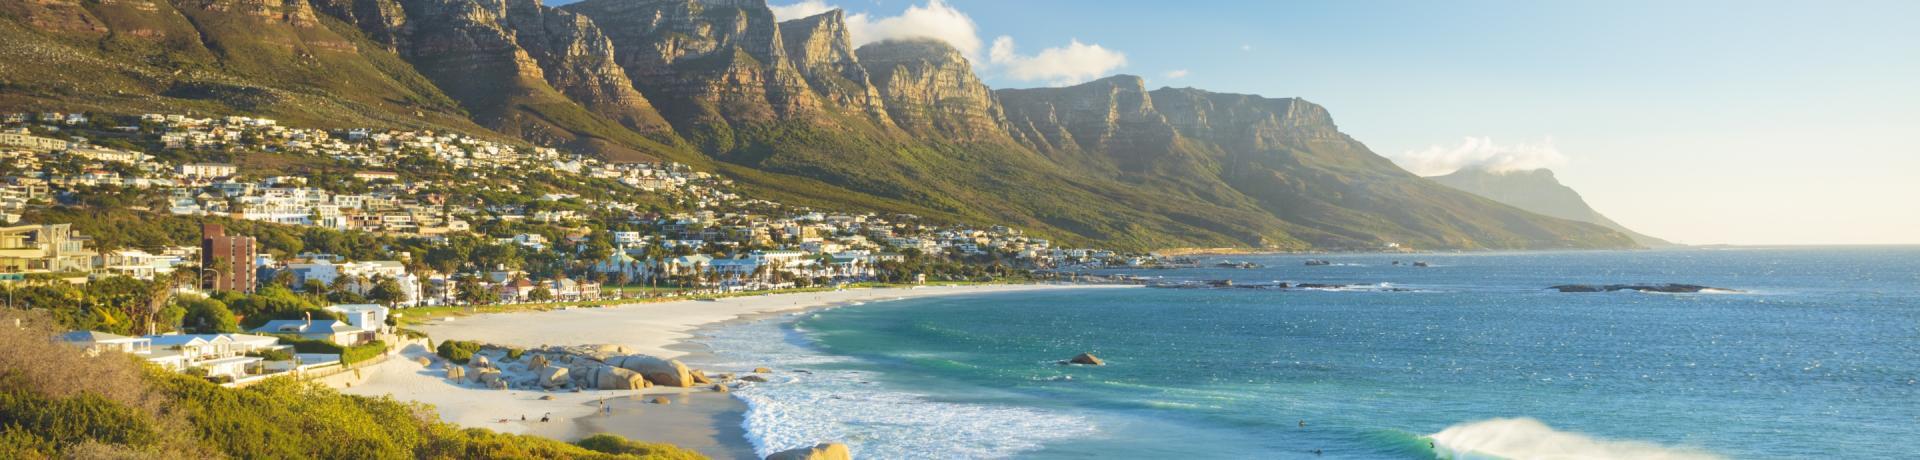 3787+Südafrika+Camps_Bay_(Kapstadt)+Camps_Bay+GI-477451698.jpg